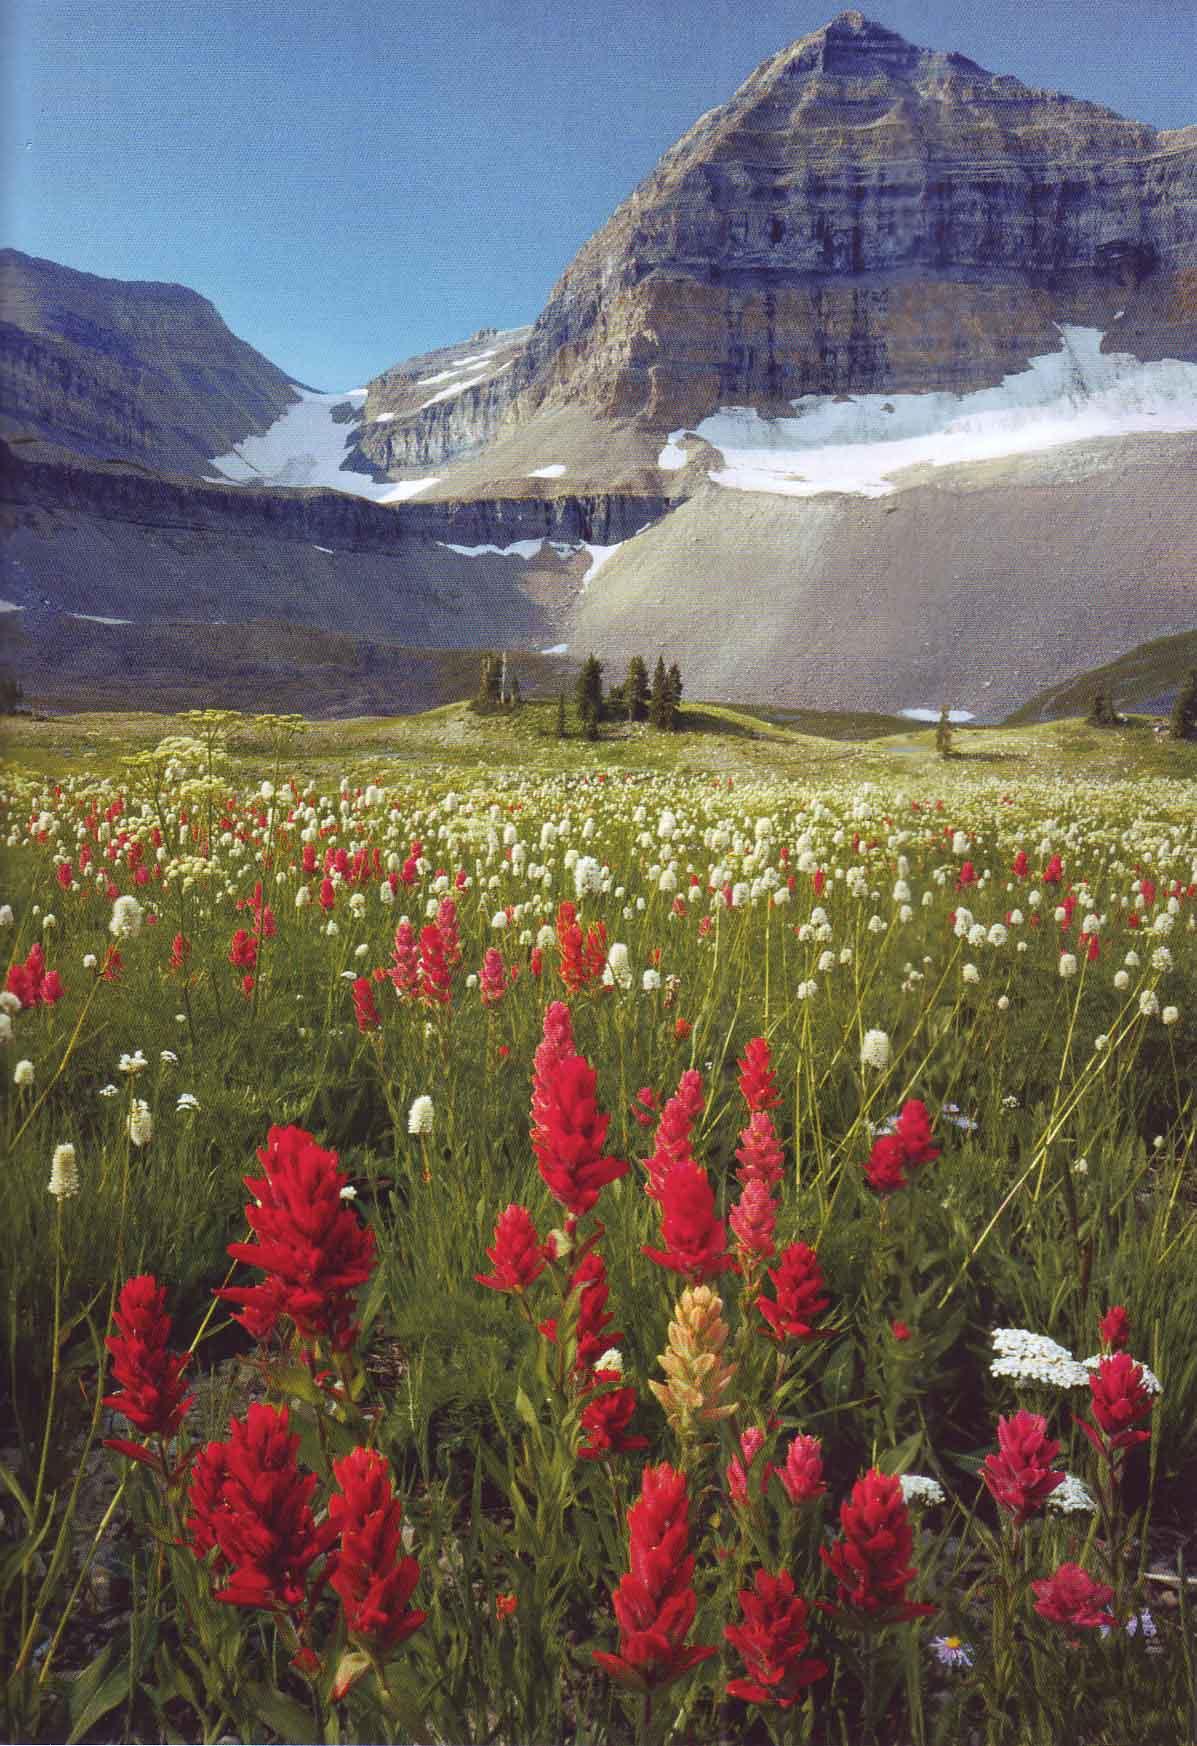 Scott smith photography utah Download Adobe Photodeluxe Home Edition 4.0 - MajorGeeks